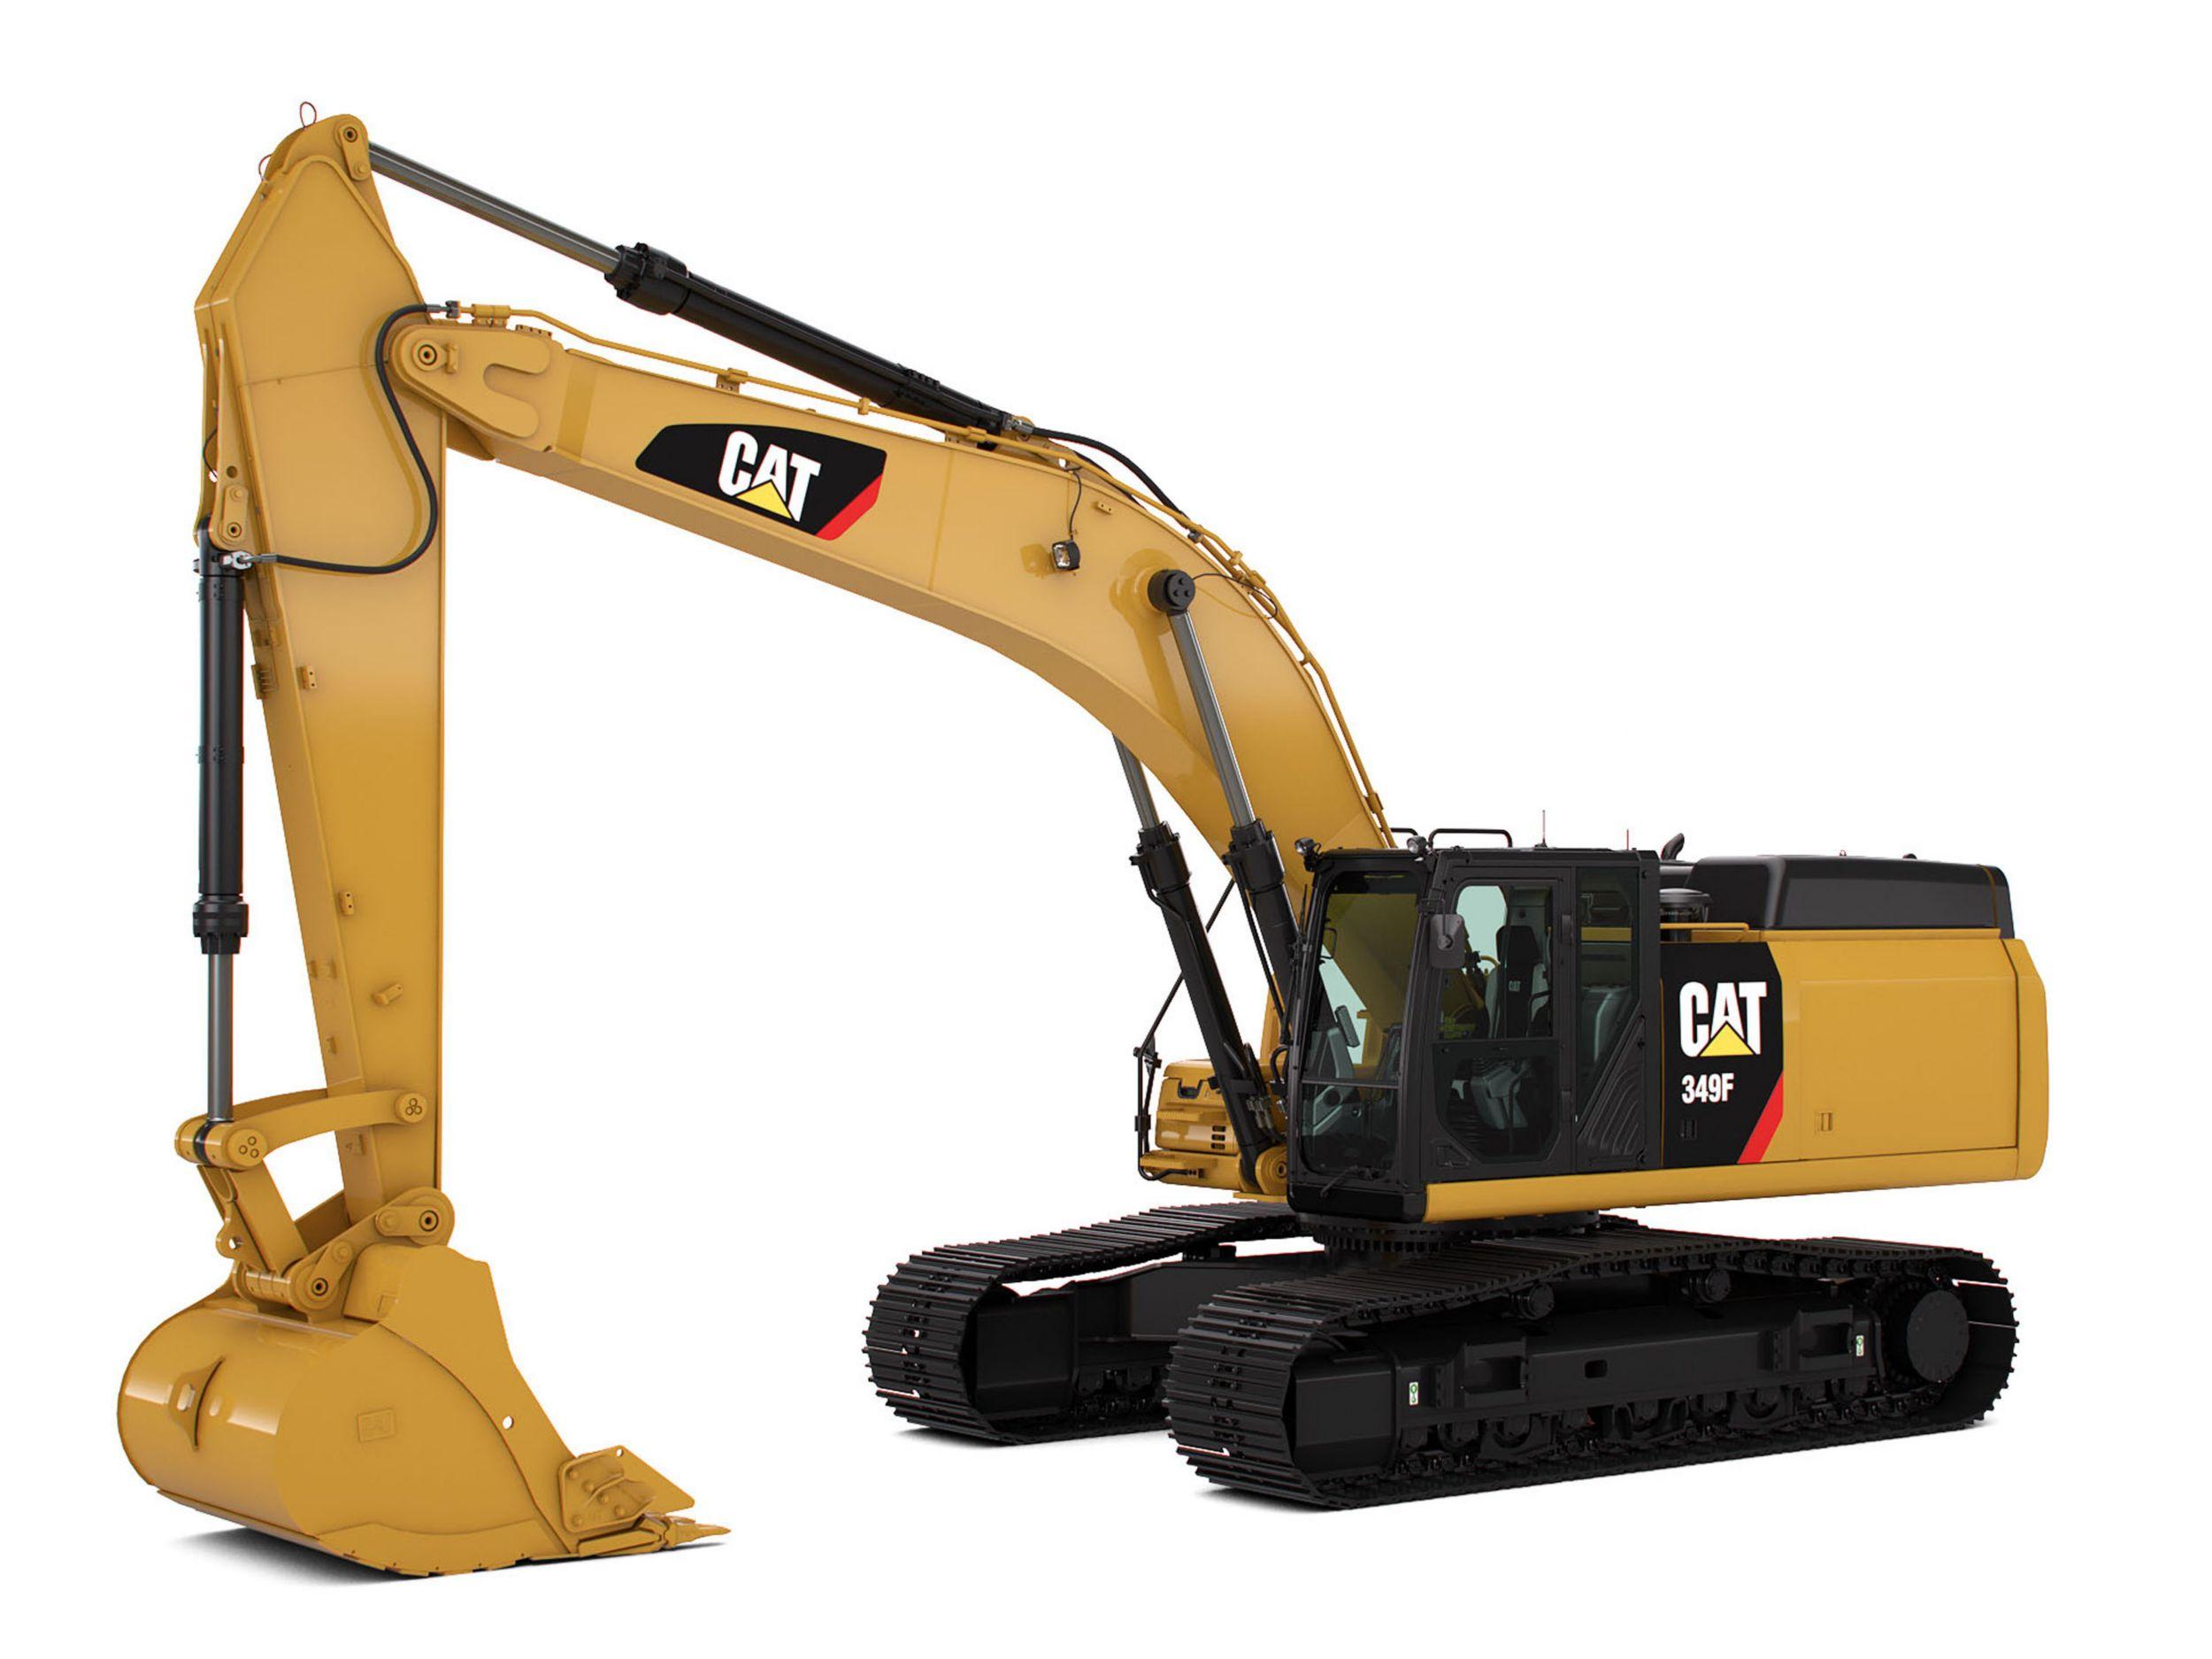 349F Hydraulic Excavator